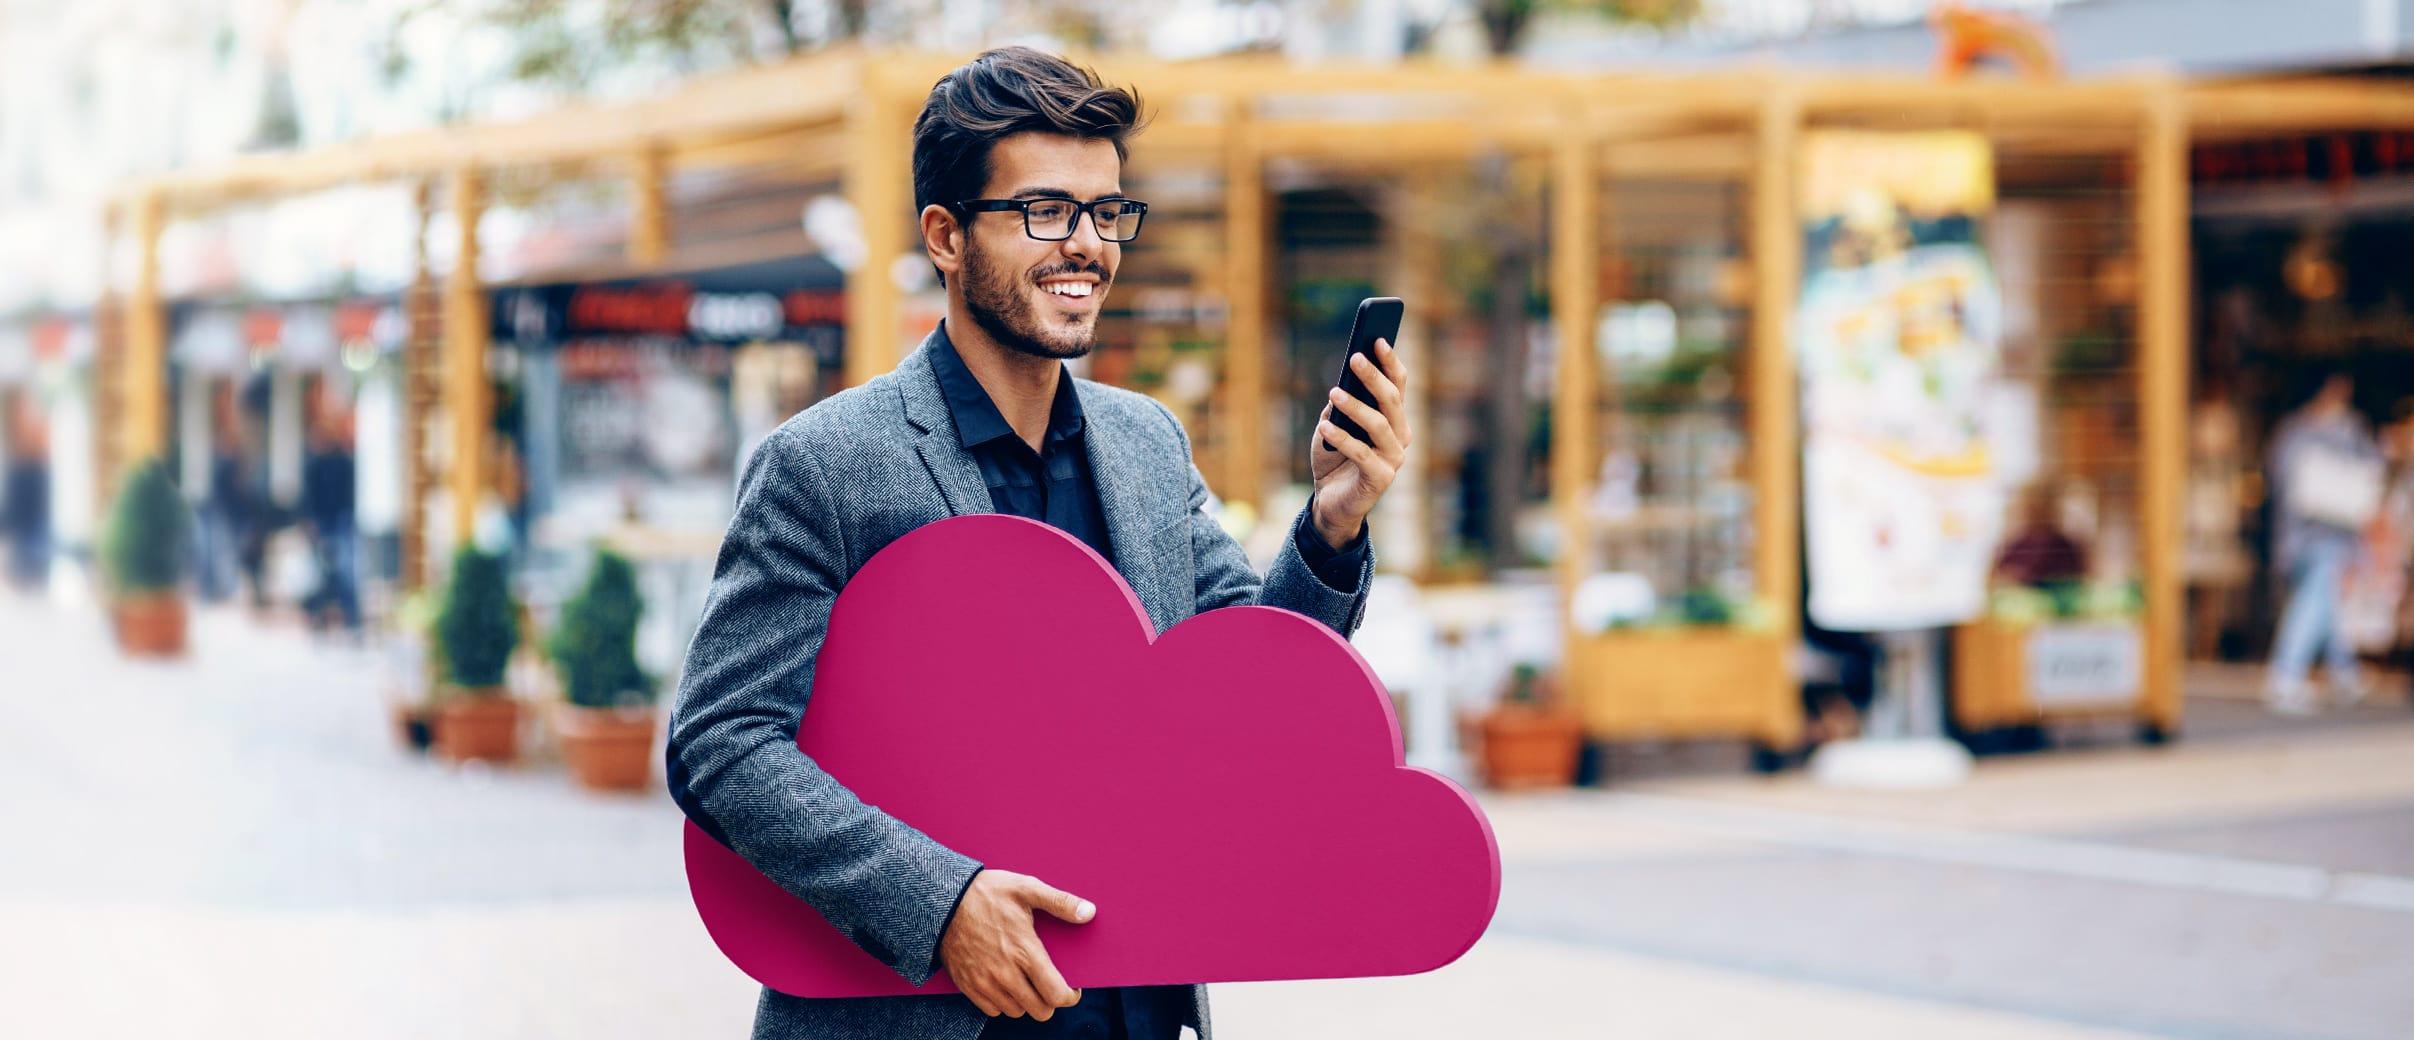 Cloud Service - Man with Signavio Cloud in hand